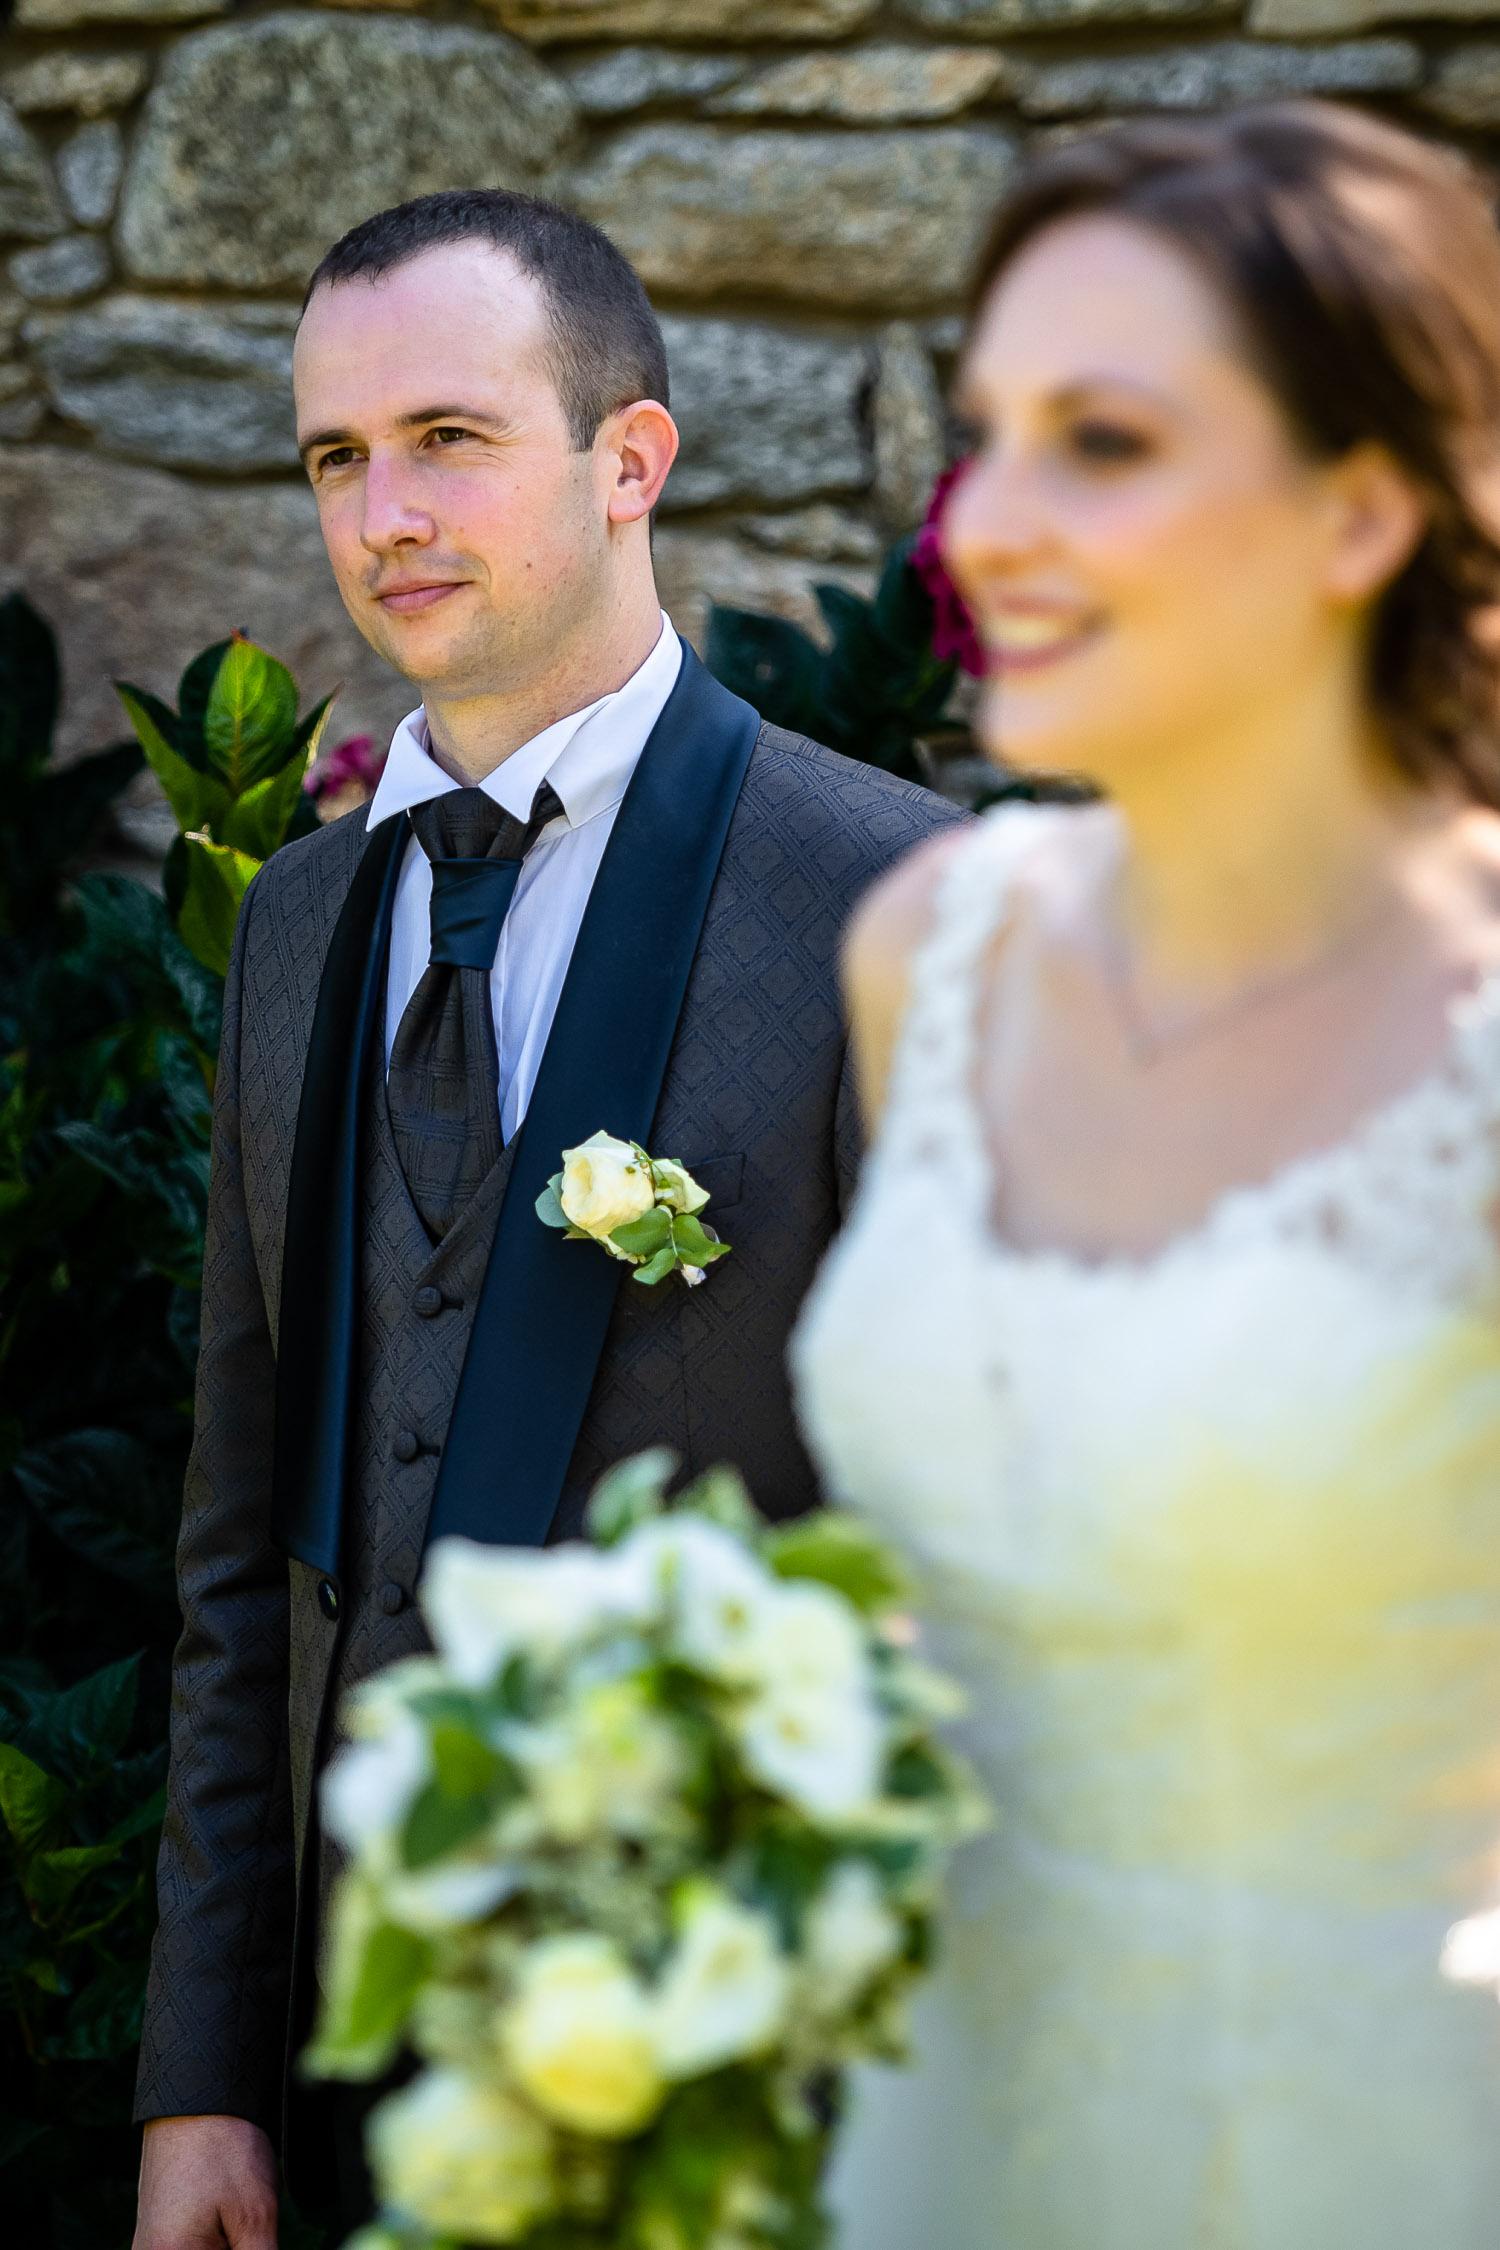 PAOLO-MANTOVAN-FOTOGRAFIA-ROMANTIC-WEDDING-IN-PIEMONTE-ADRIANA-E-LUCA-MAISON-VERTE-119